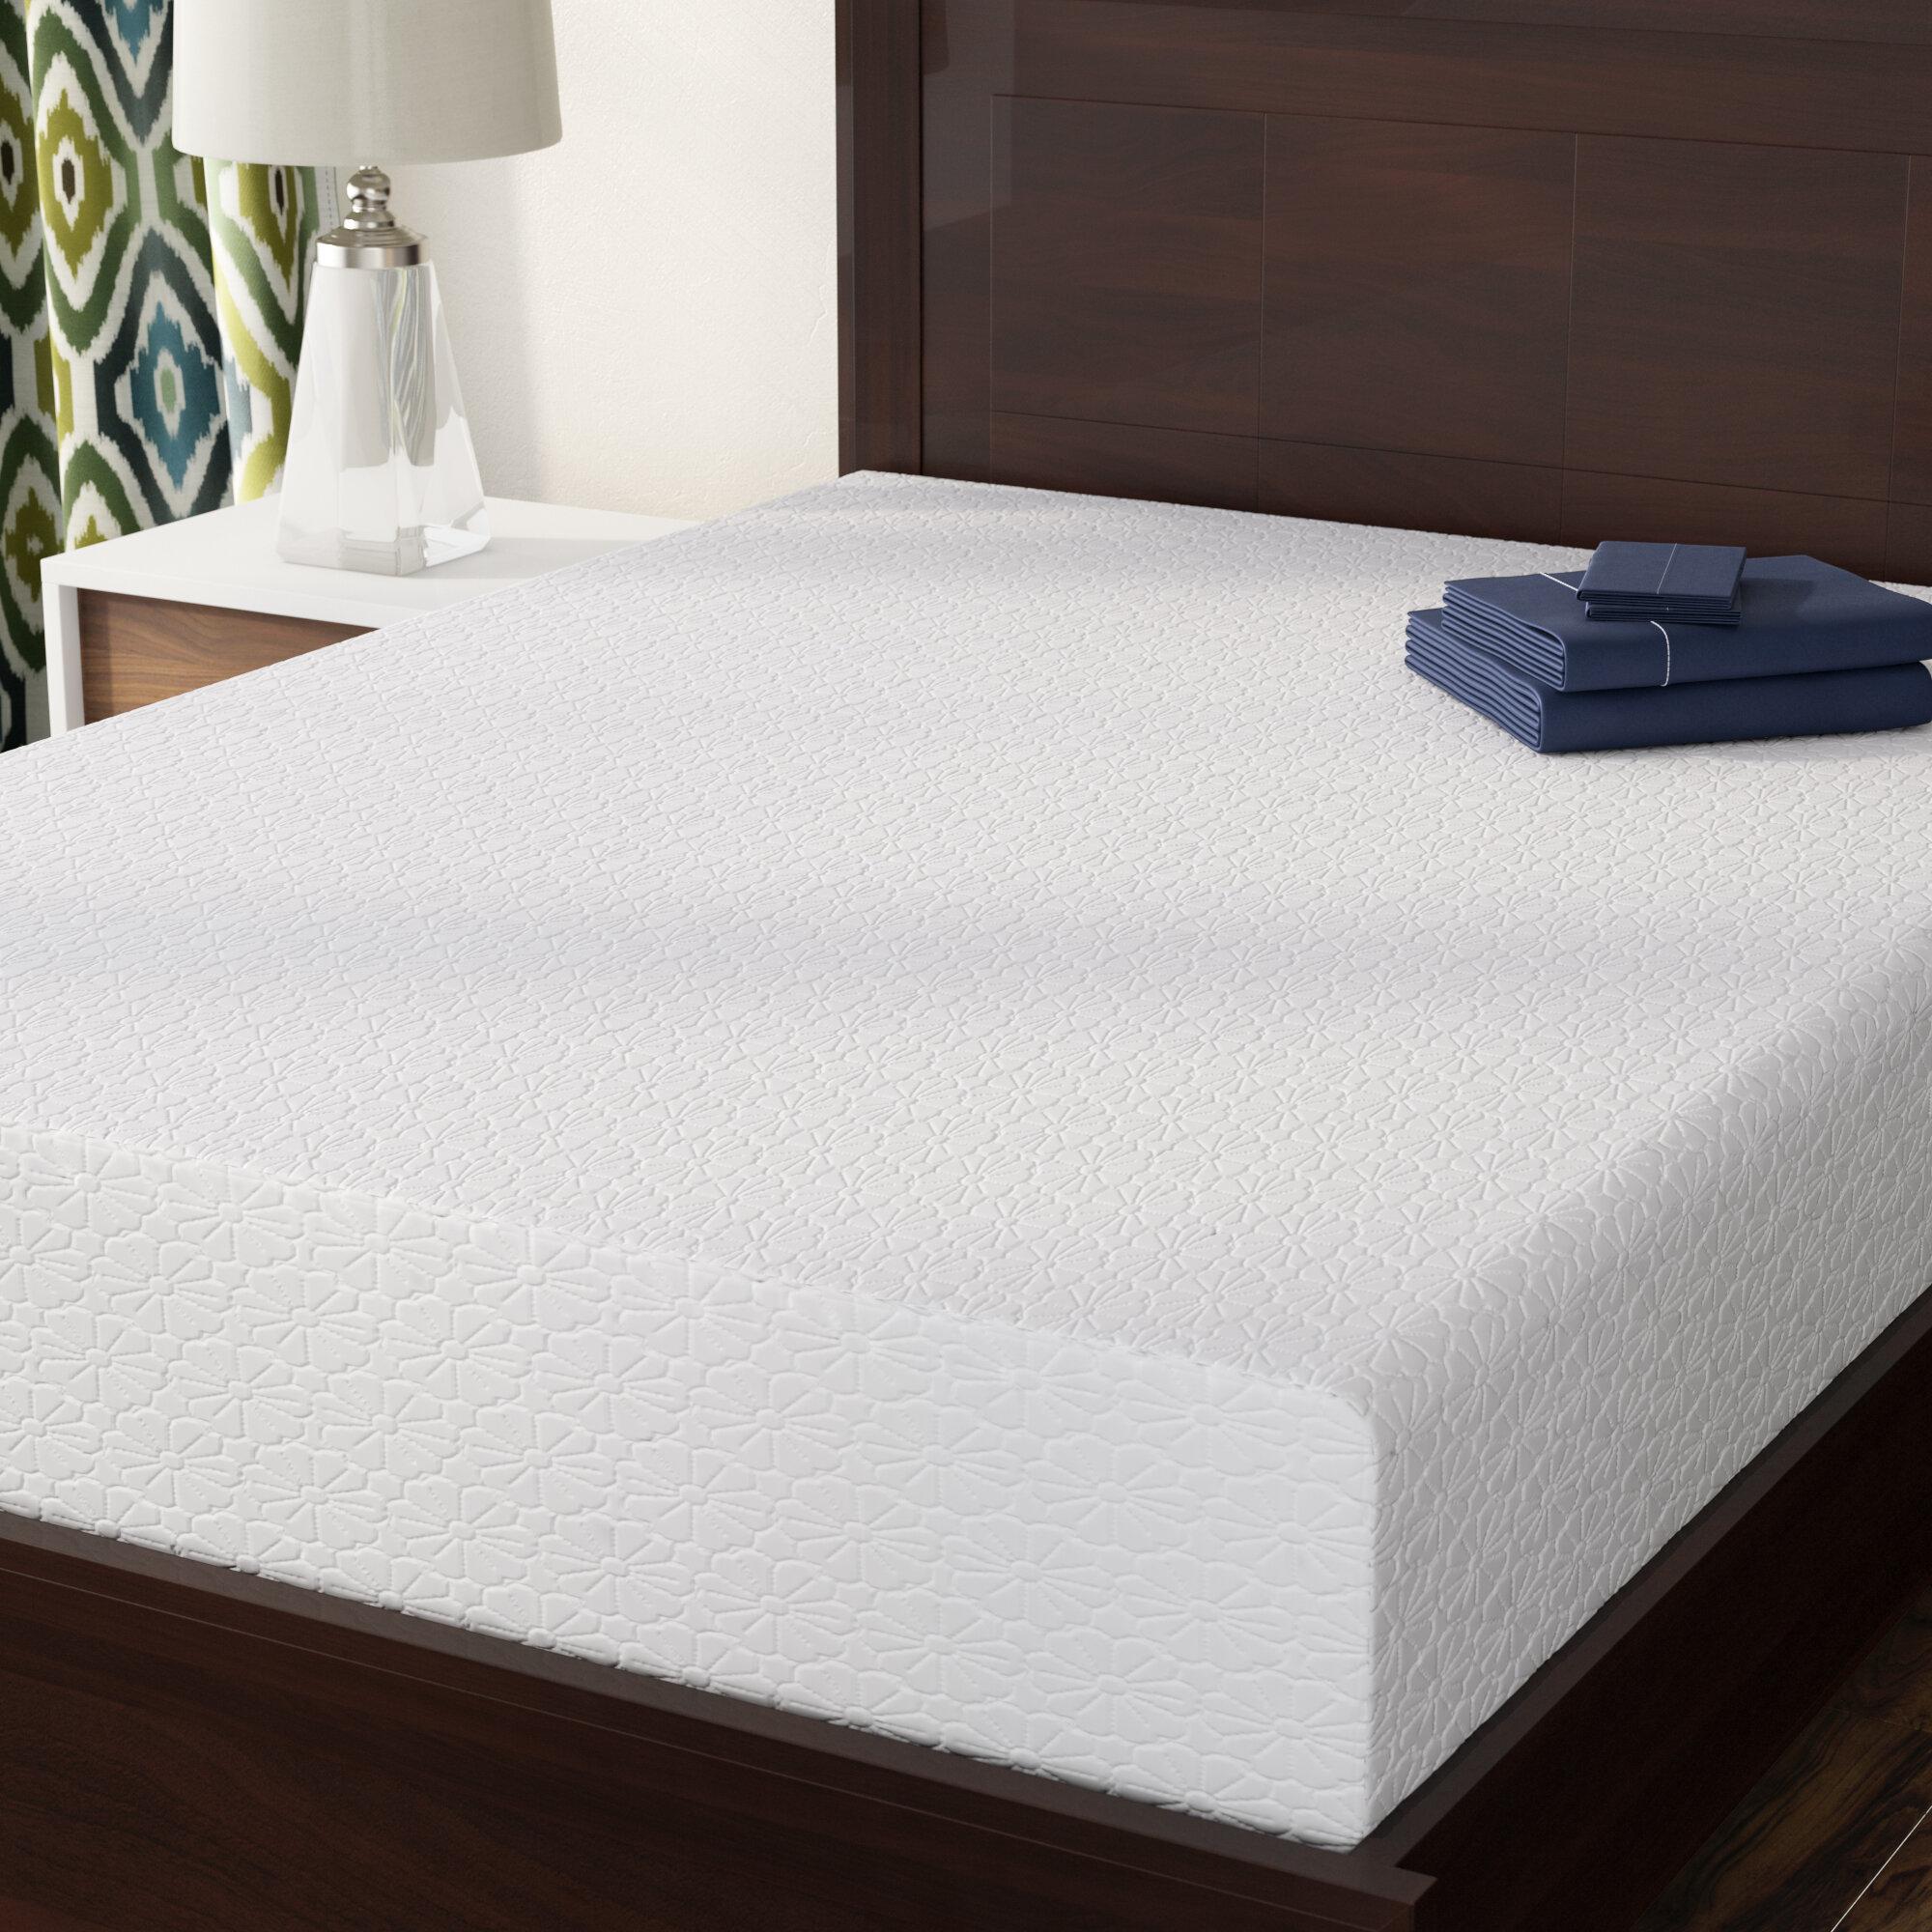 alwyn home 10 medium memory foam mattress reviews wayfair